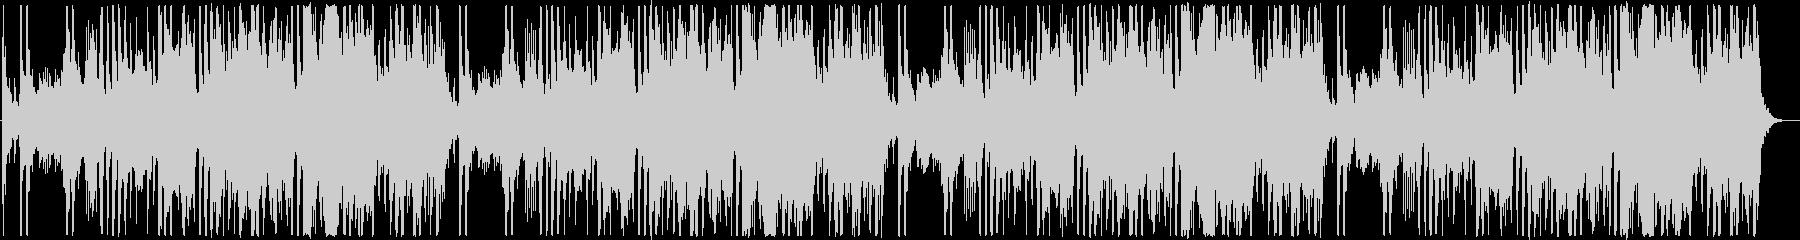 RPGのフィールドBGM風オーケストラ曲の未再生の波形